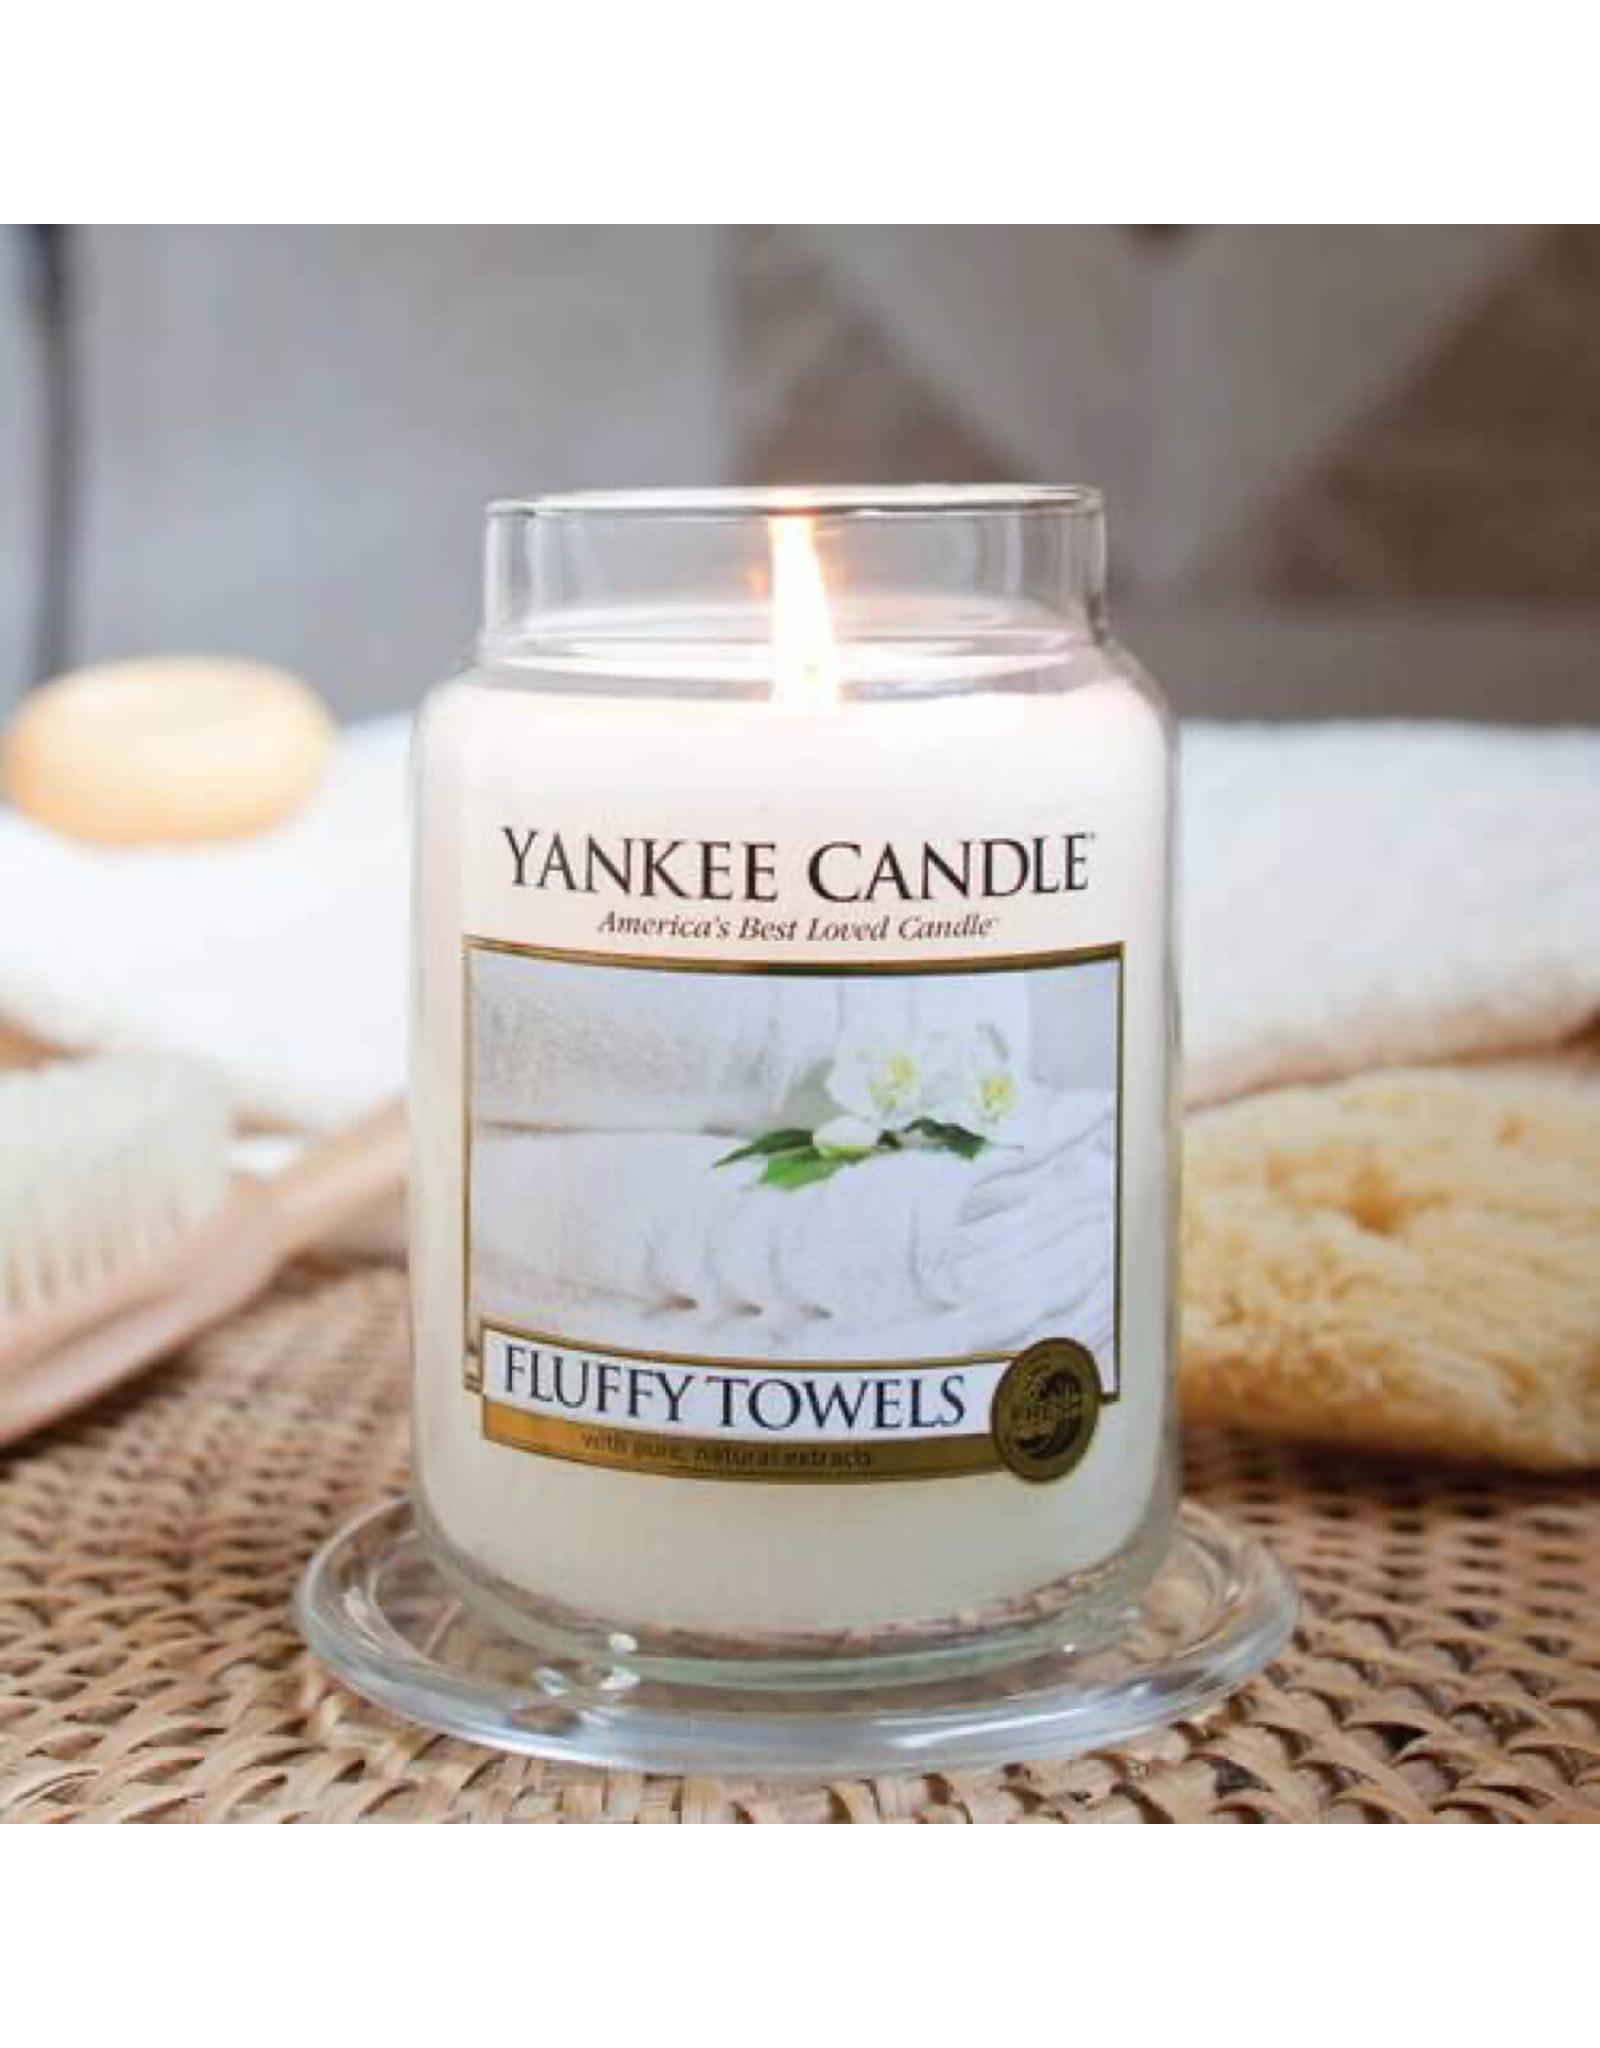 Yankee Candle Yankee Candle Large